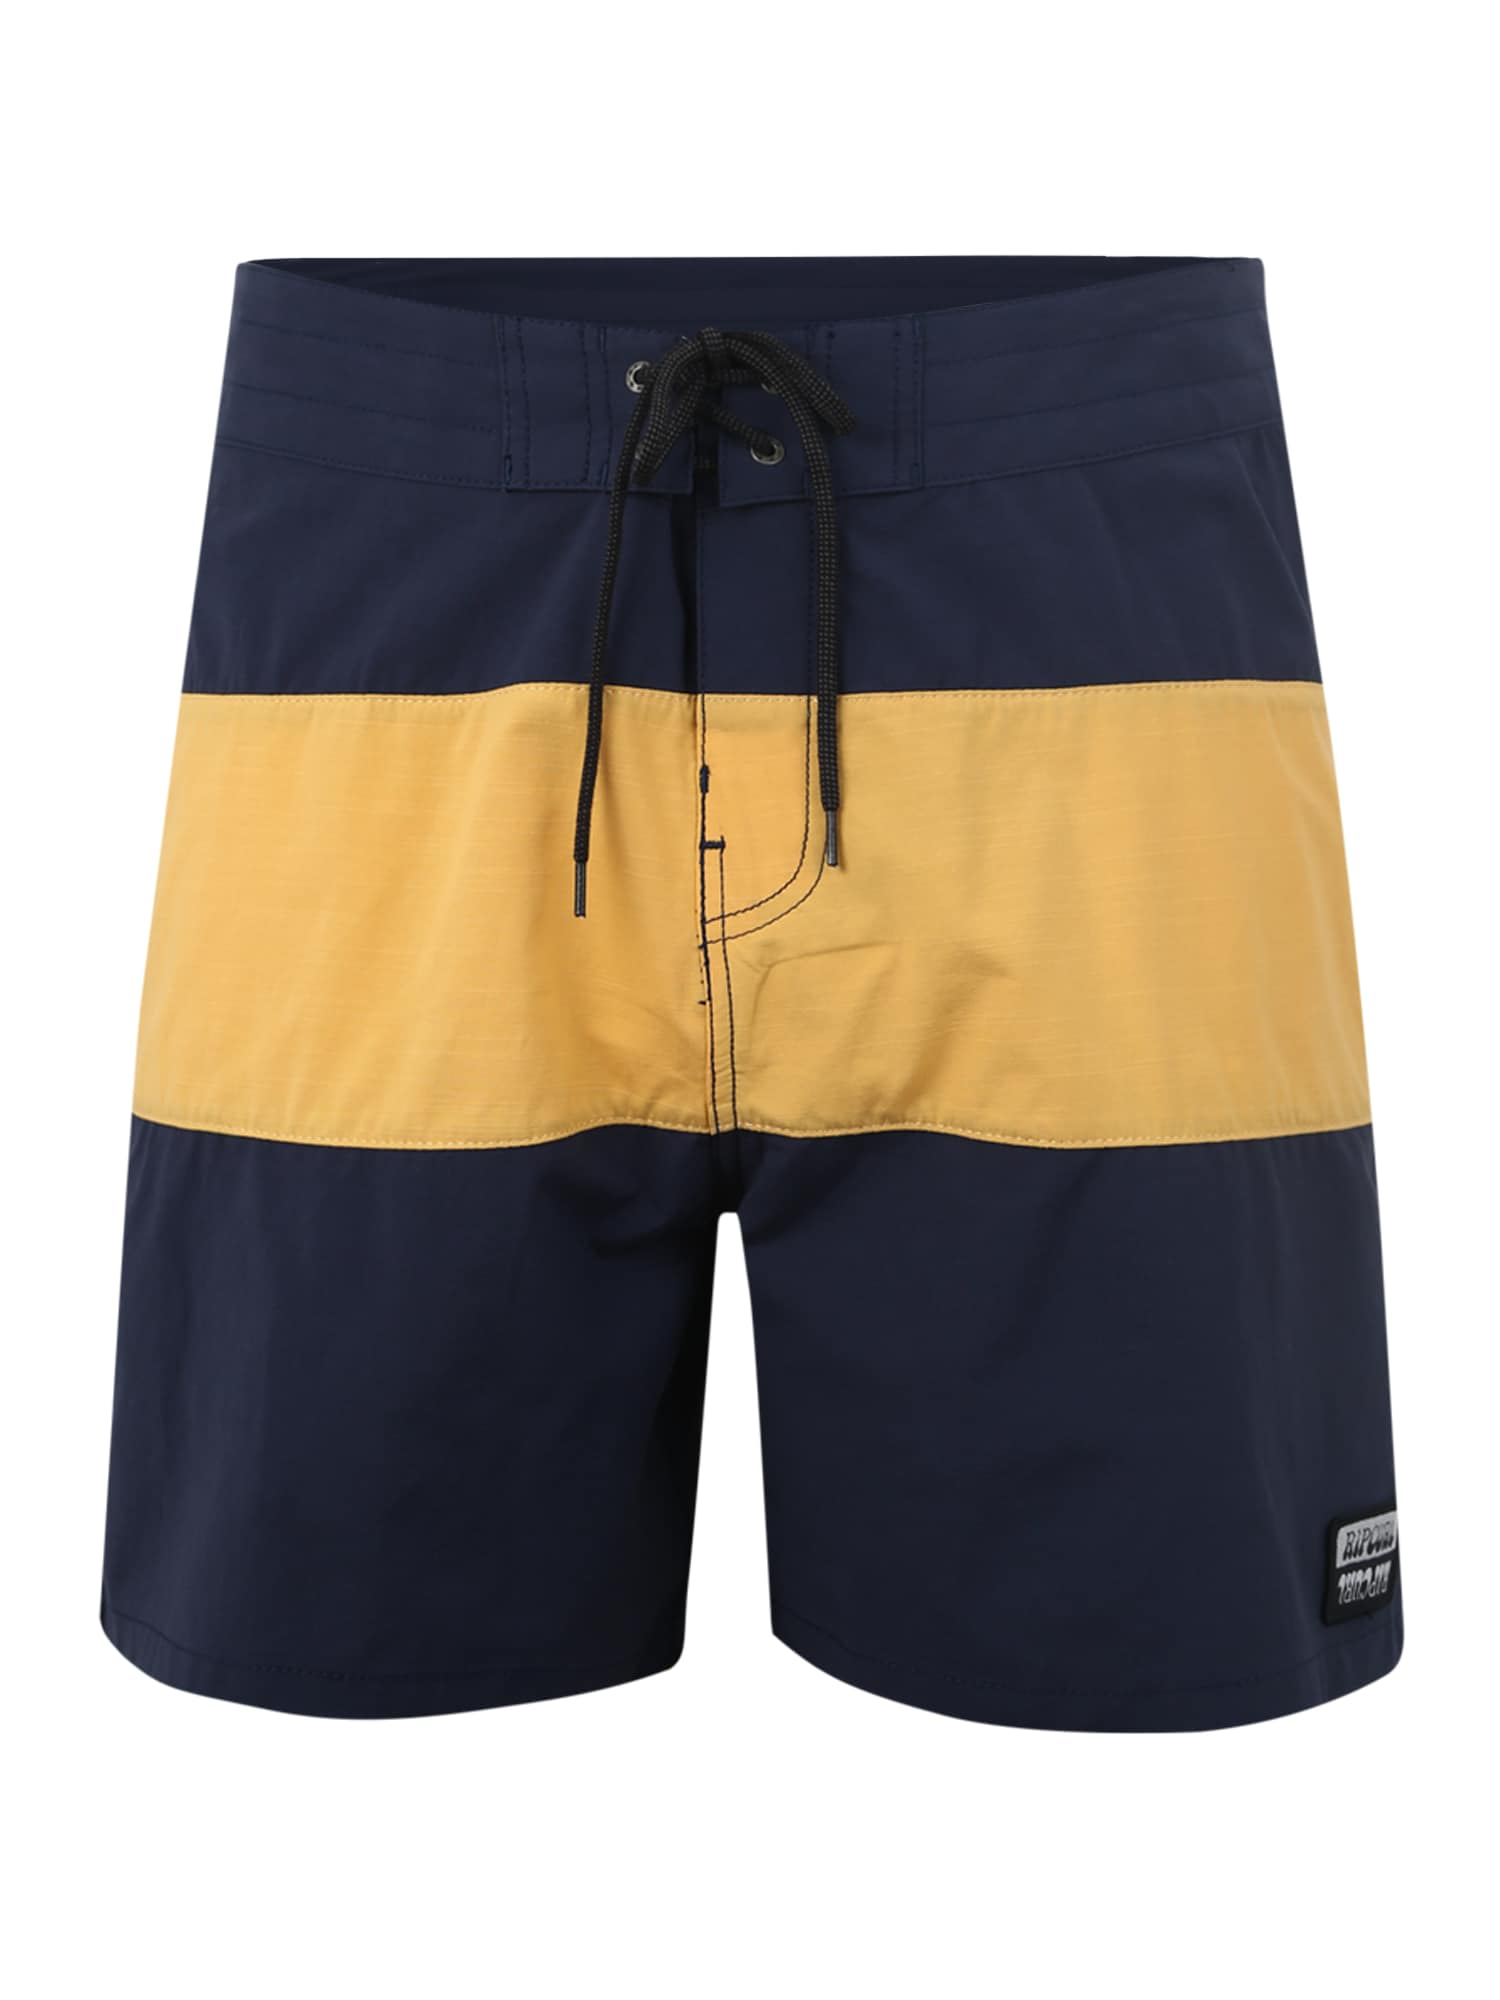 Plavecké šortky RETRO PANELED 17 modrá zlatě žlutá RIP CURL